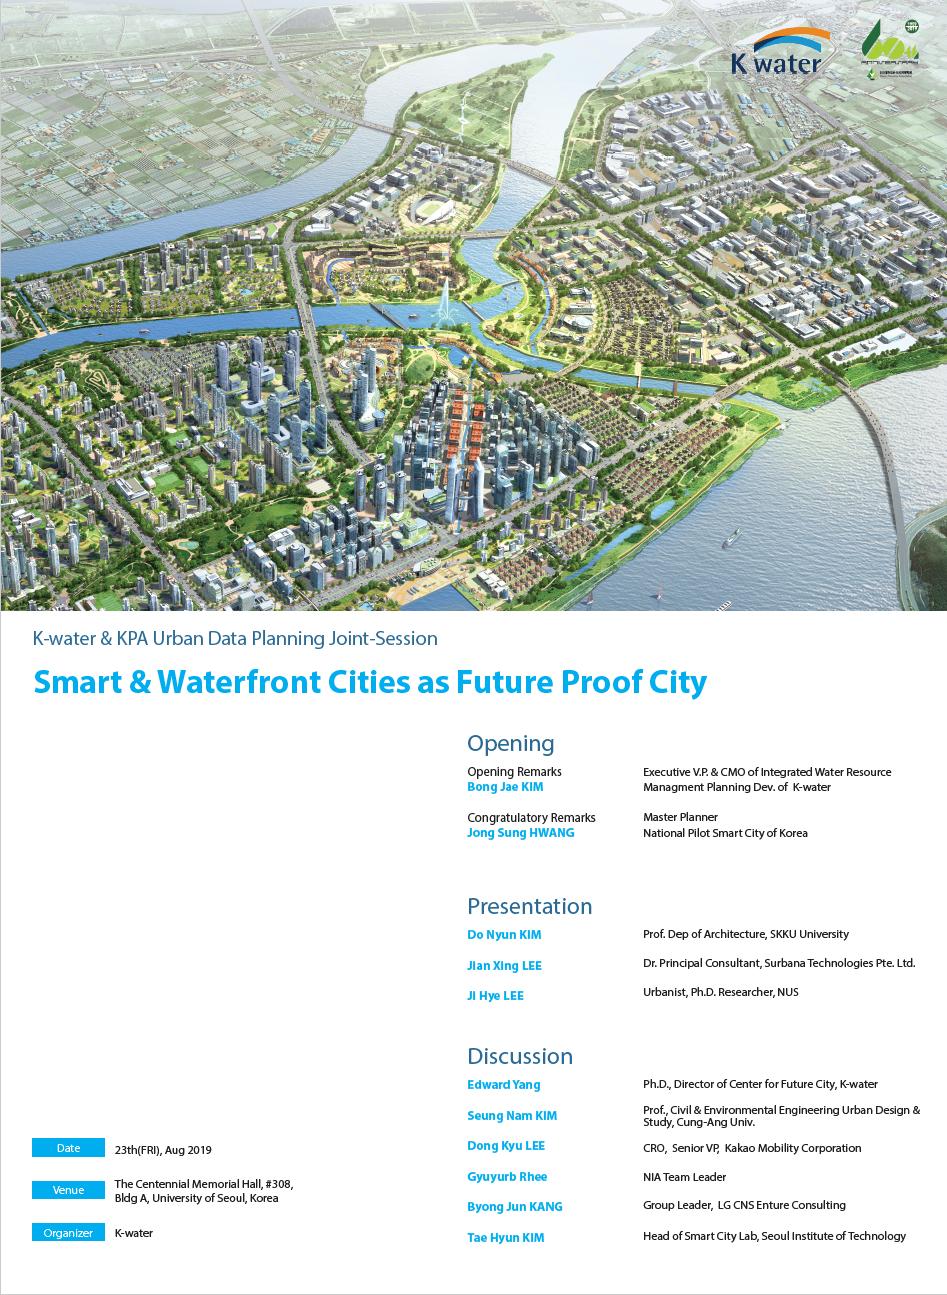 K-water & 대한국토도시계획학회 Urban Data Planning 공동 포럼 개최 안내